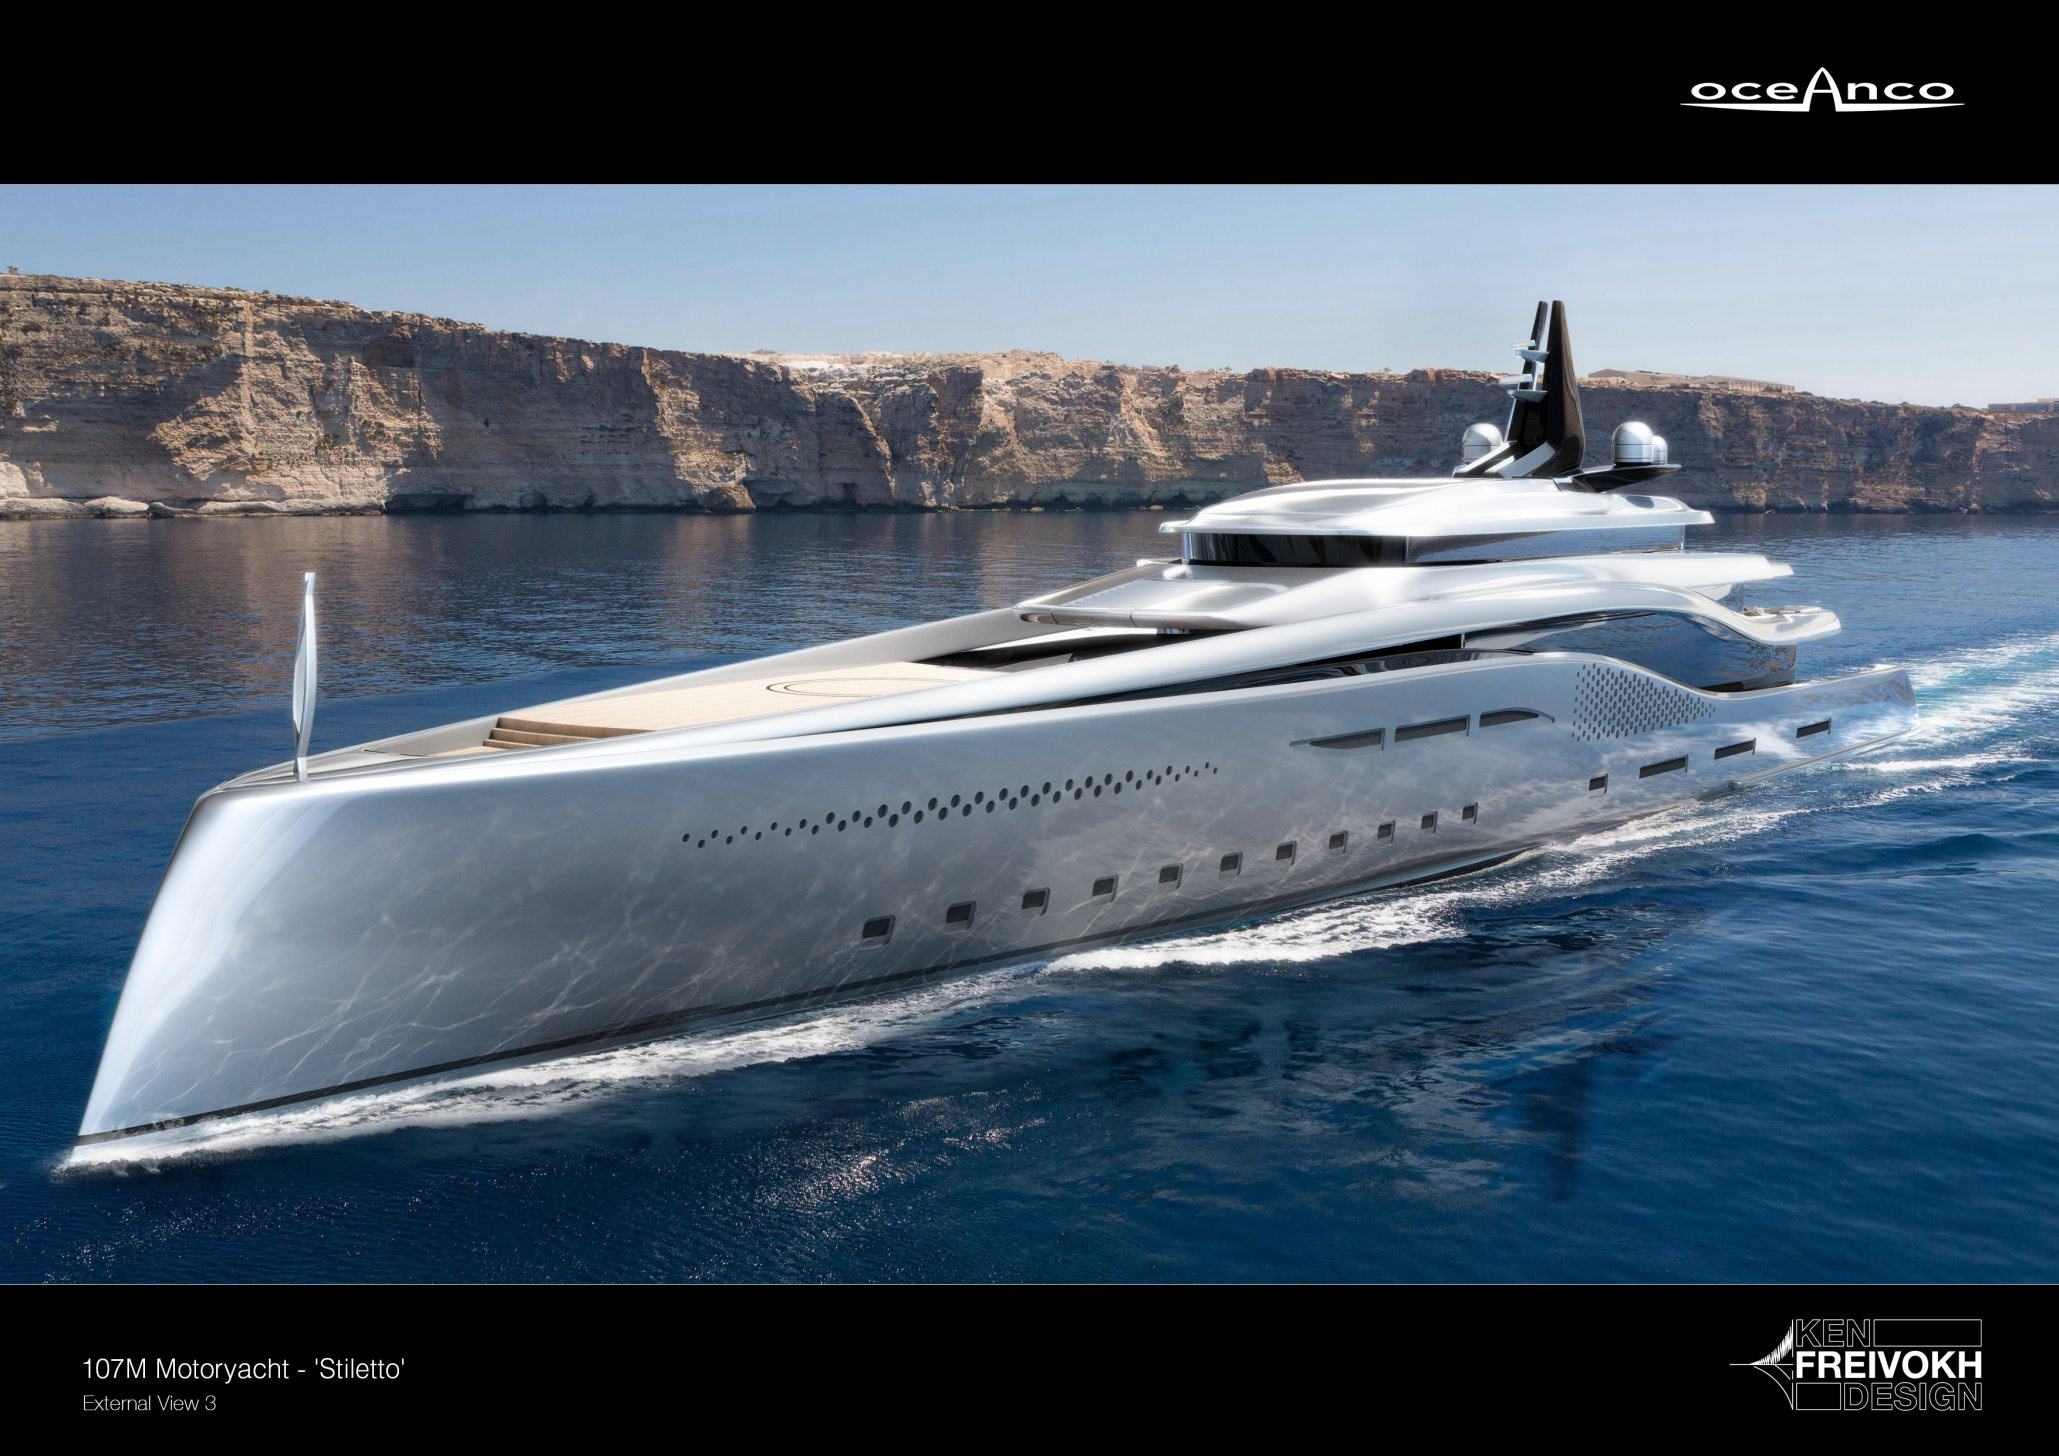 Oceanco Stiletto luxusní super jachta